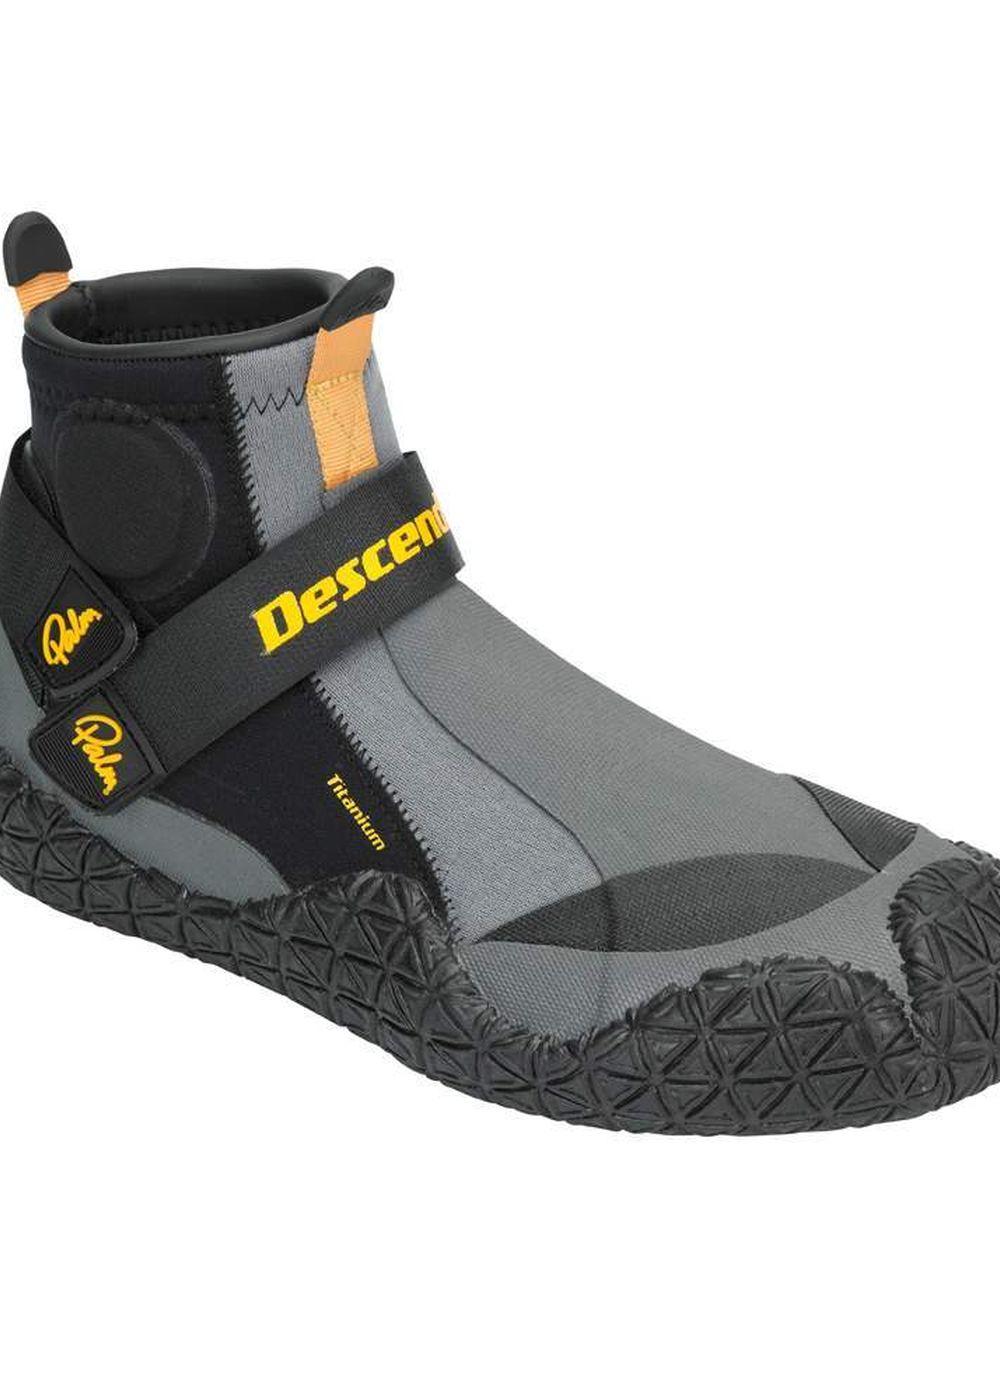 Palm Descender 4mm Wetsuit Boots Picture